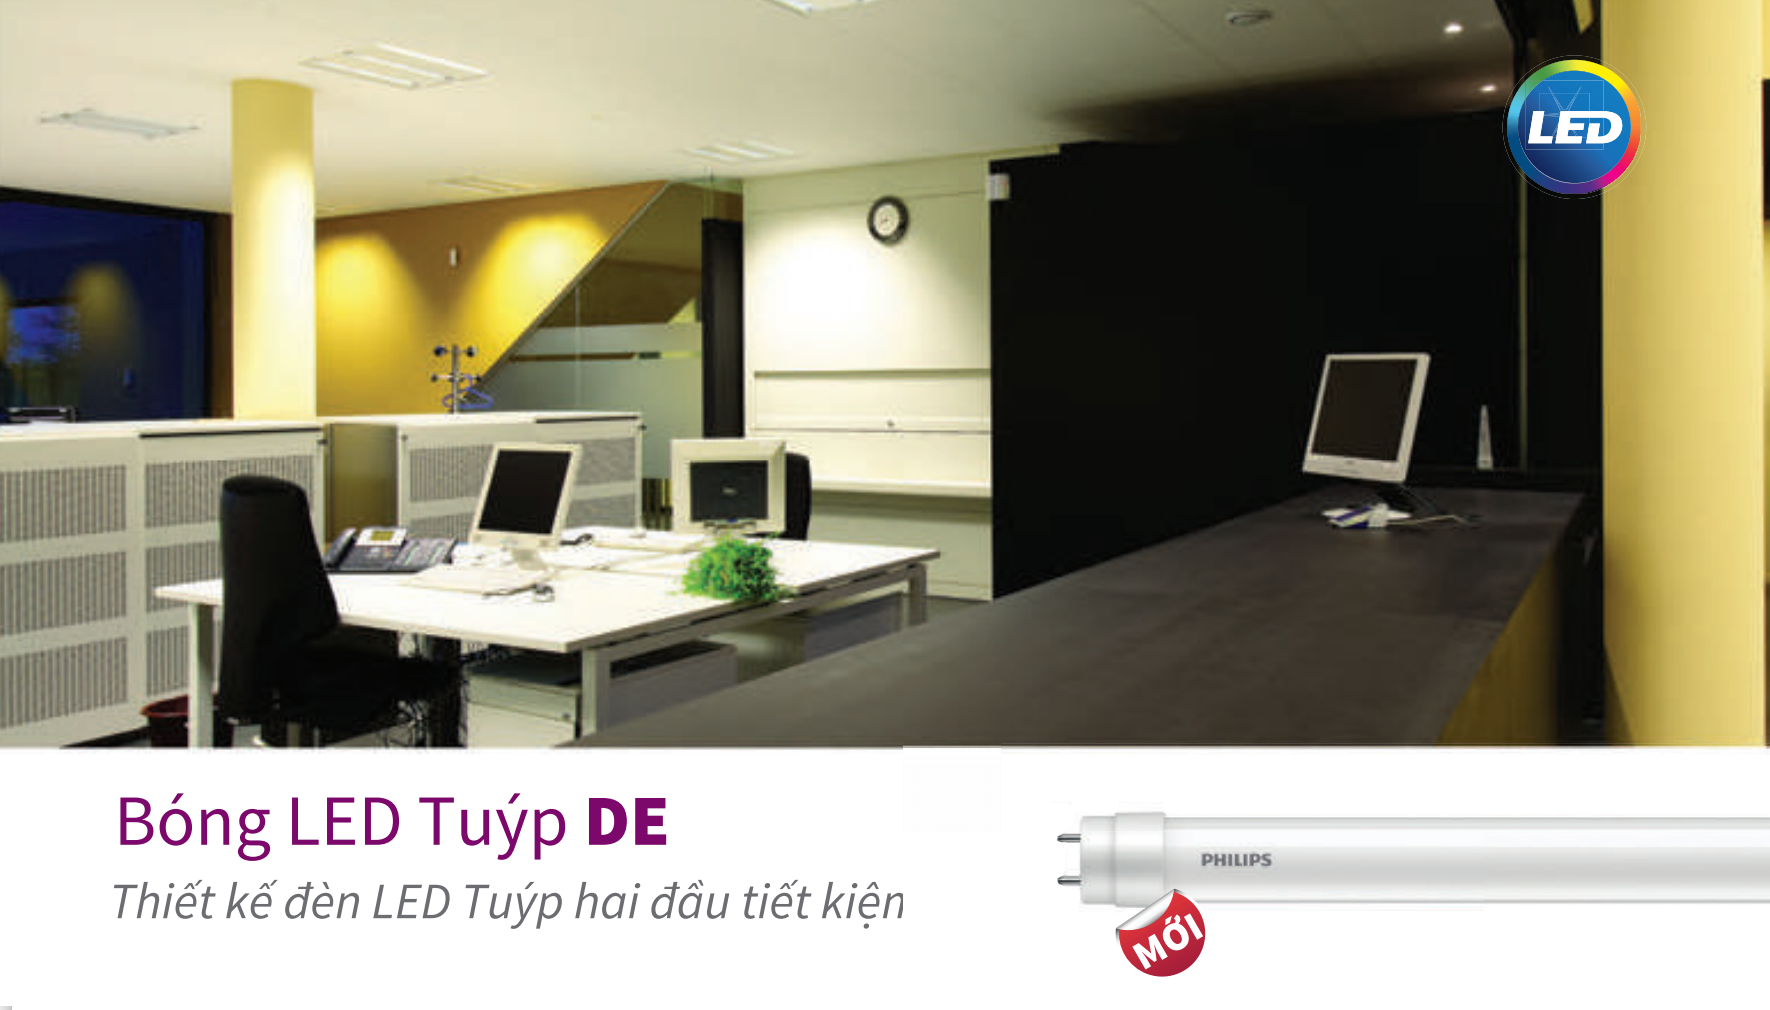 Bóng Đèn LED Tuýp Philips LED TUBE DE 600MM 9w